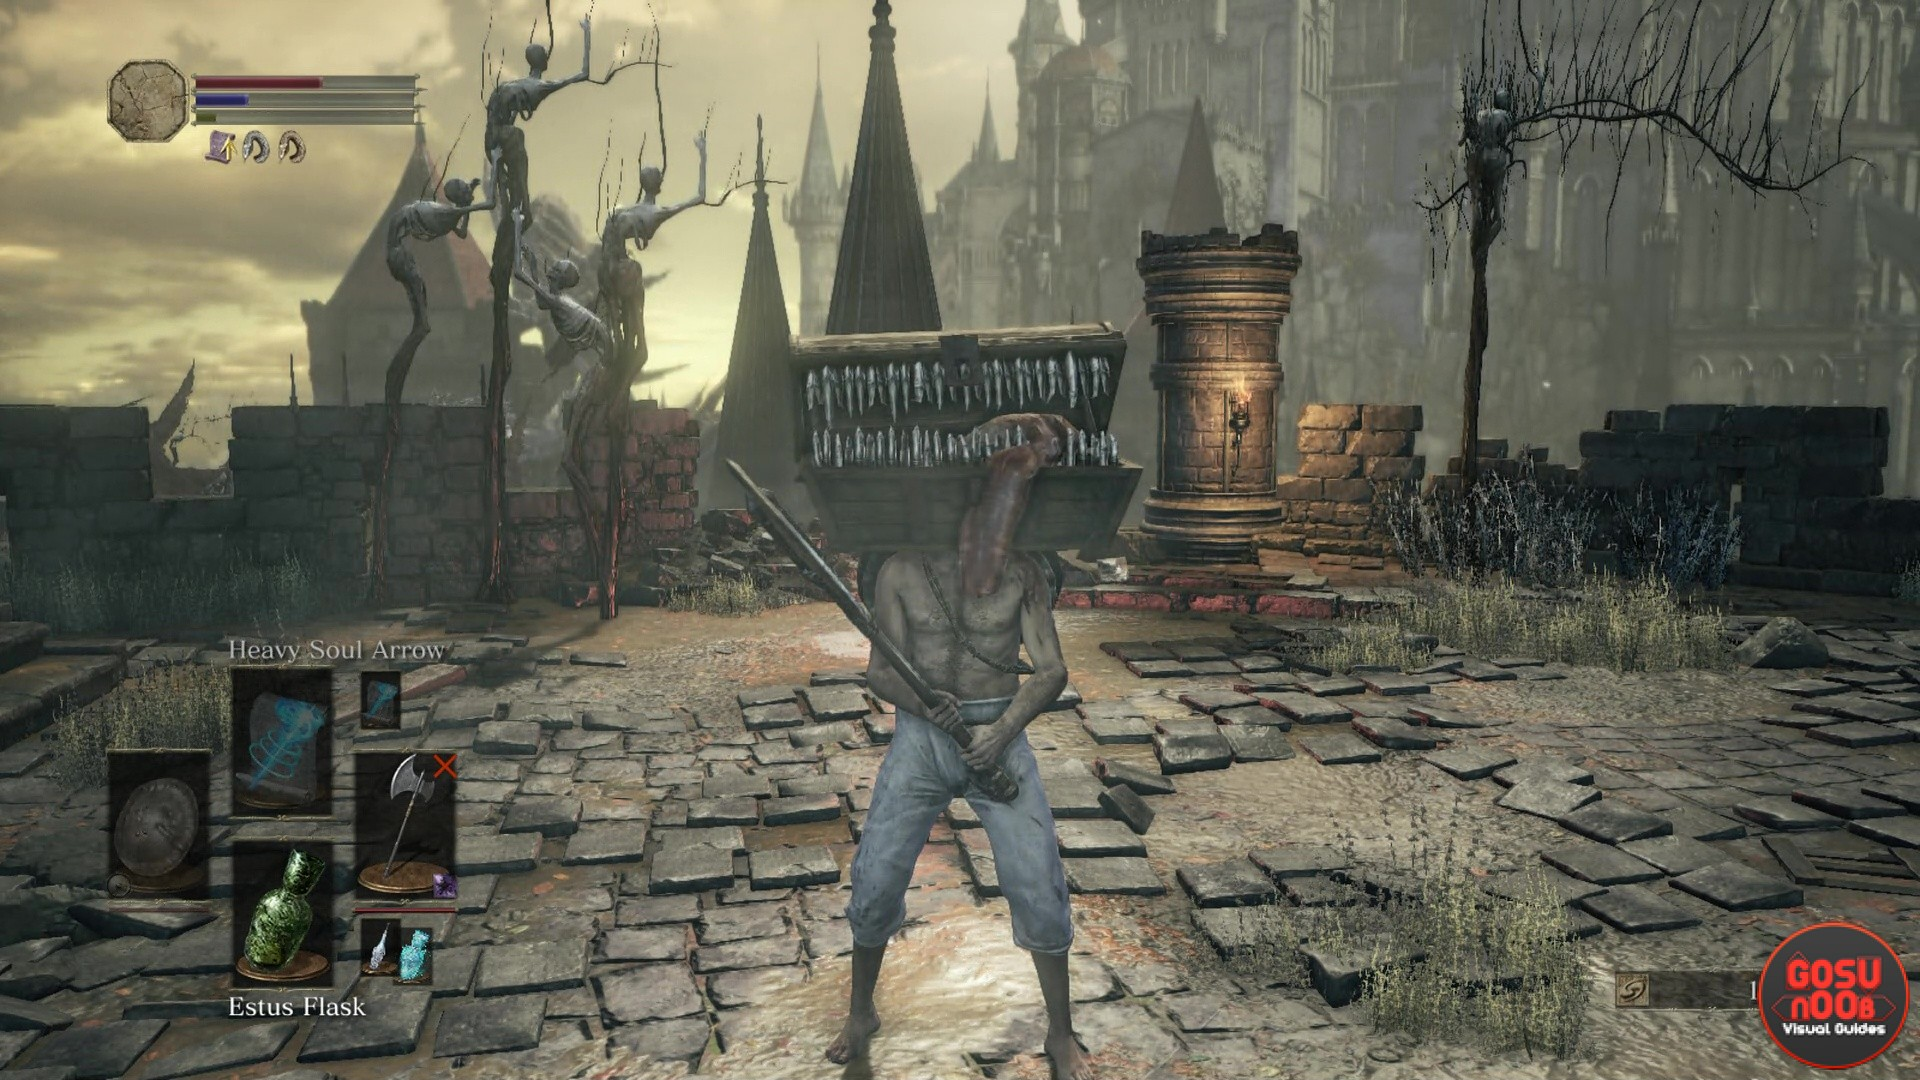 dark souls 3 symbol of avarice - How To Get The Mimic Head In Dark Souls 3